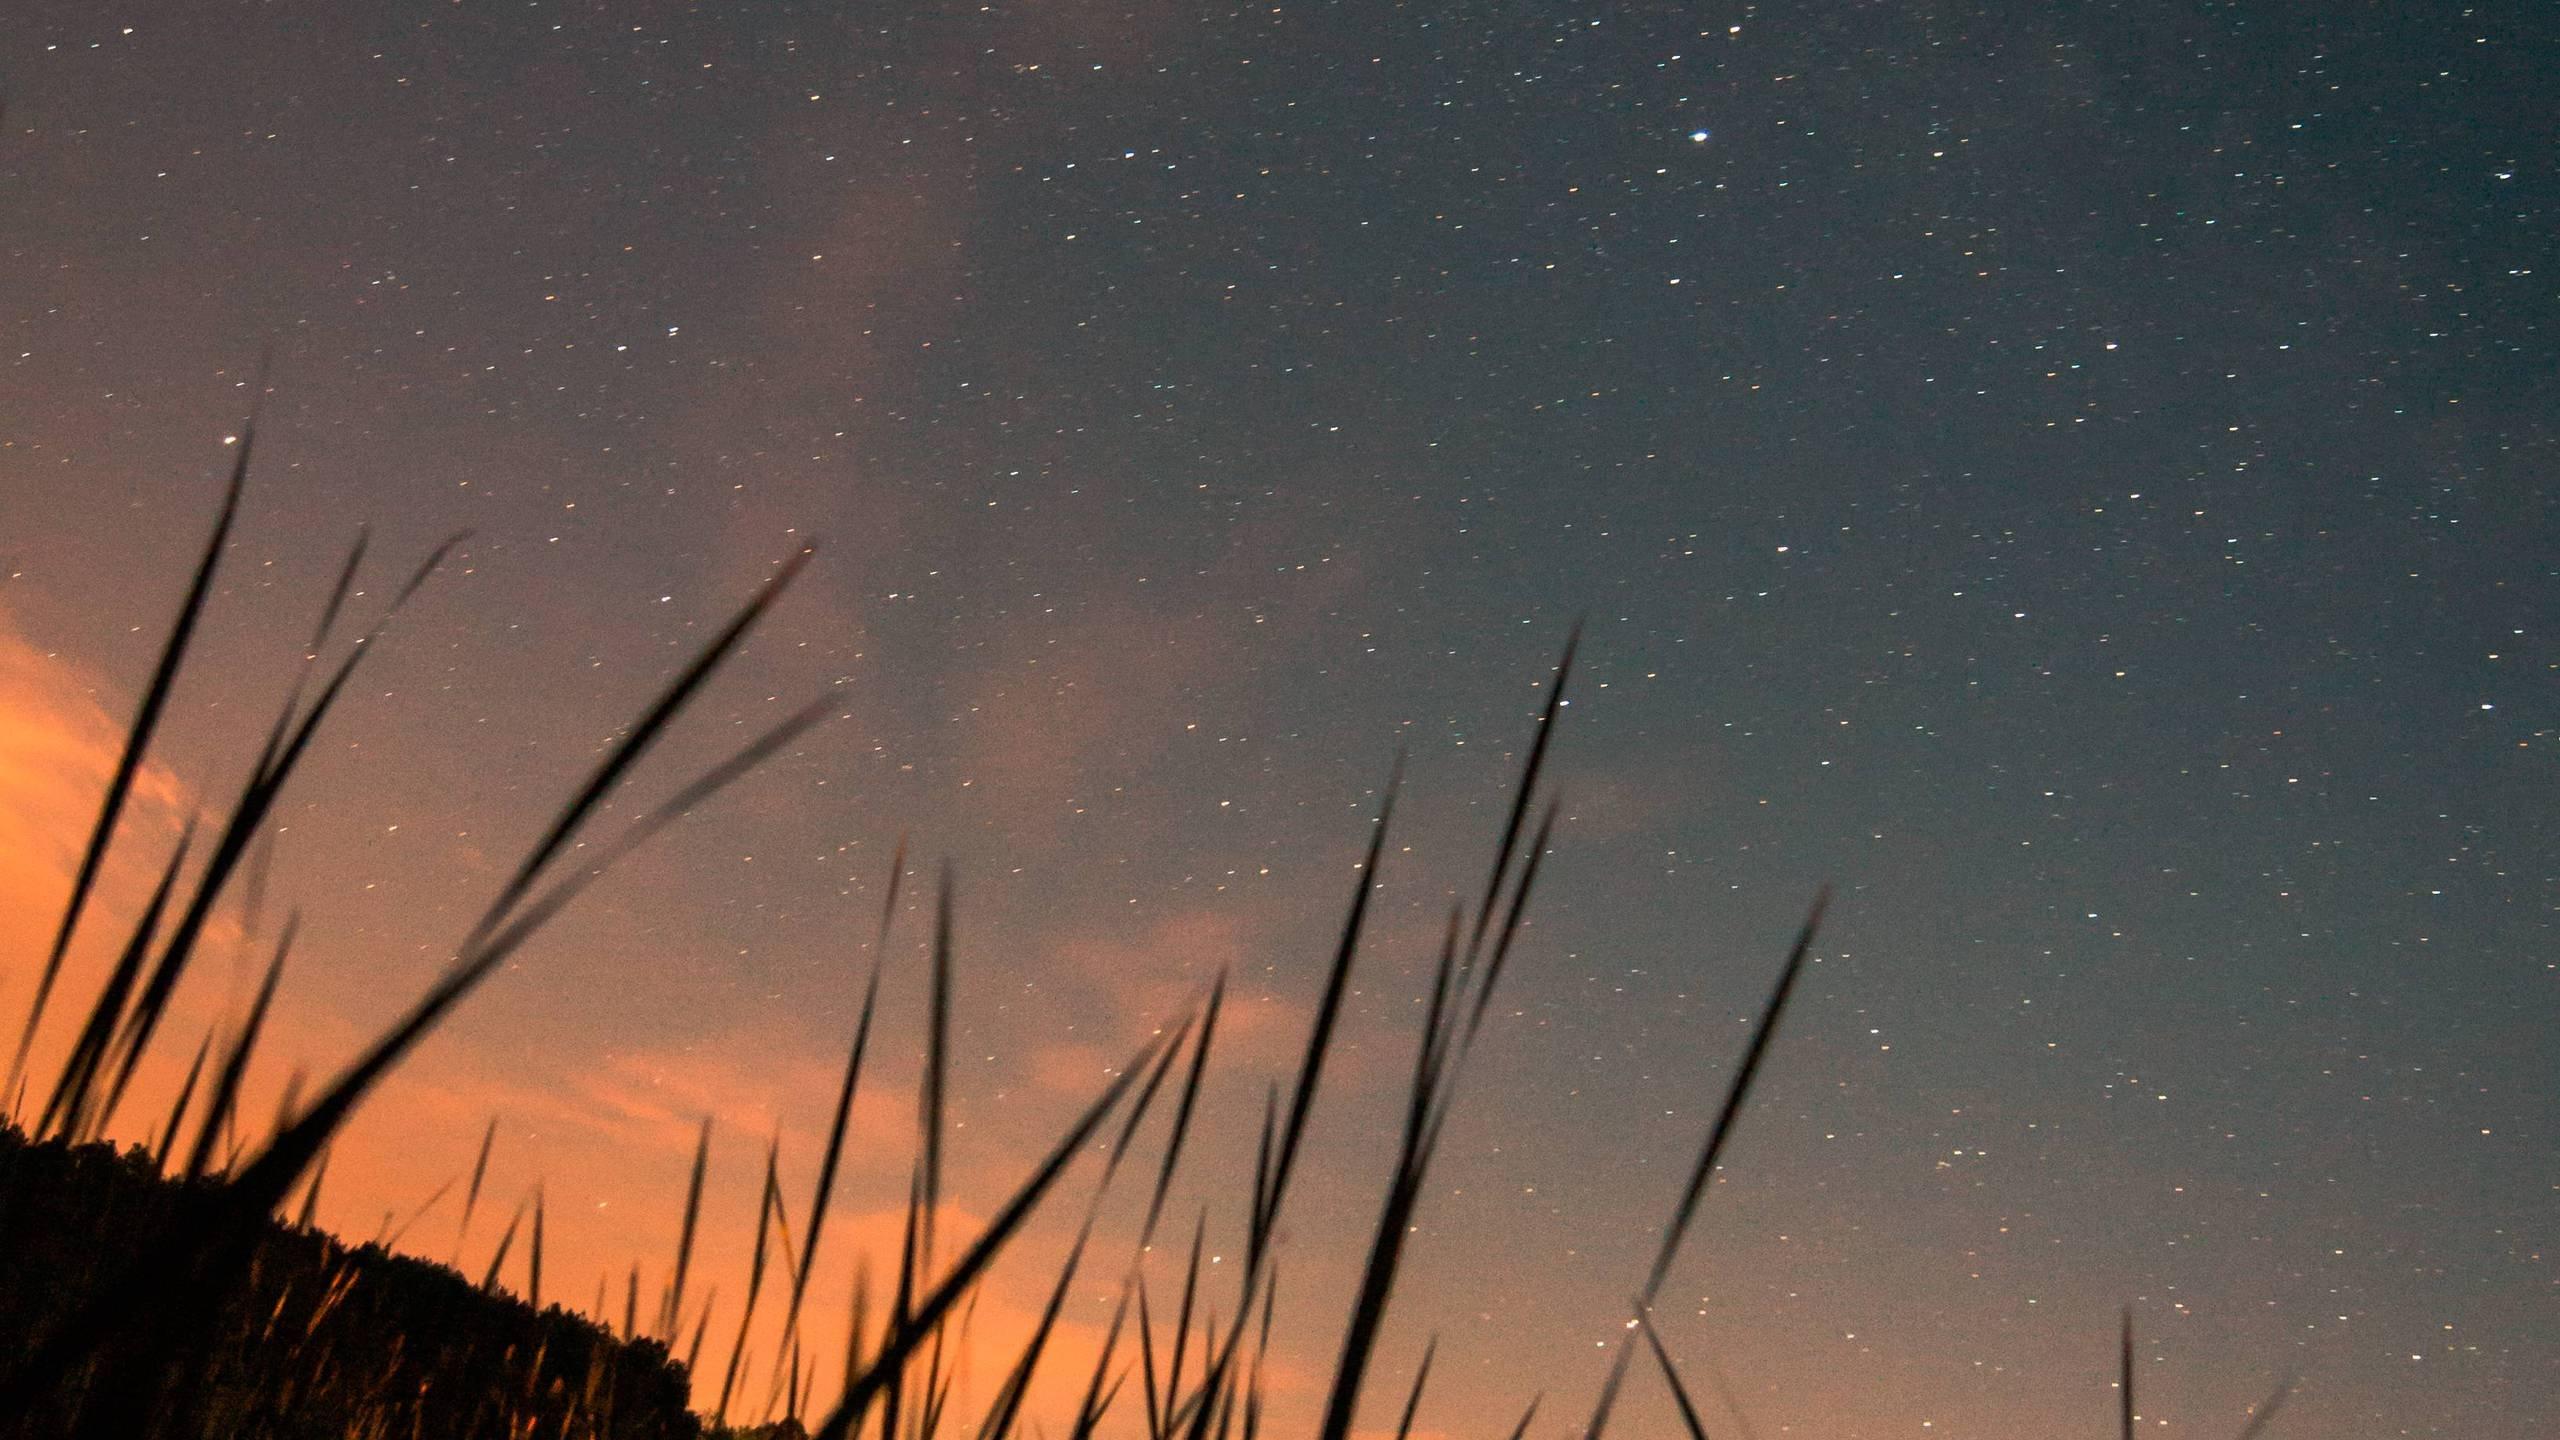 Sky Full Of Stars Hd Wallpaper